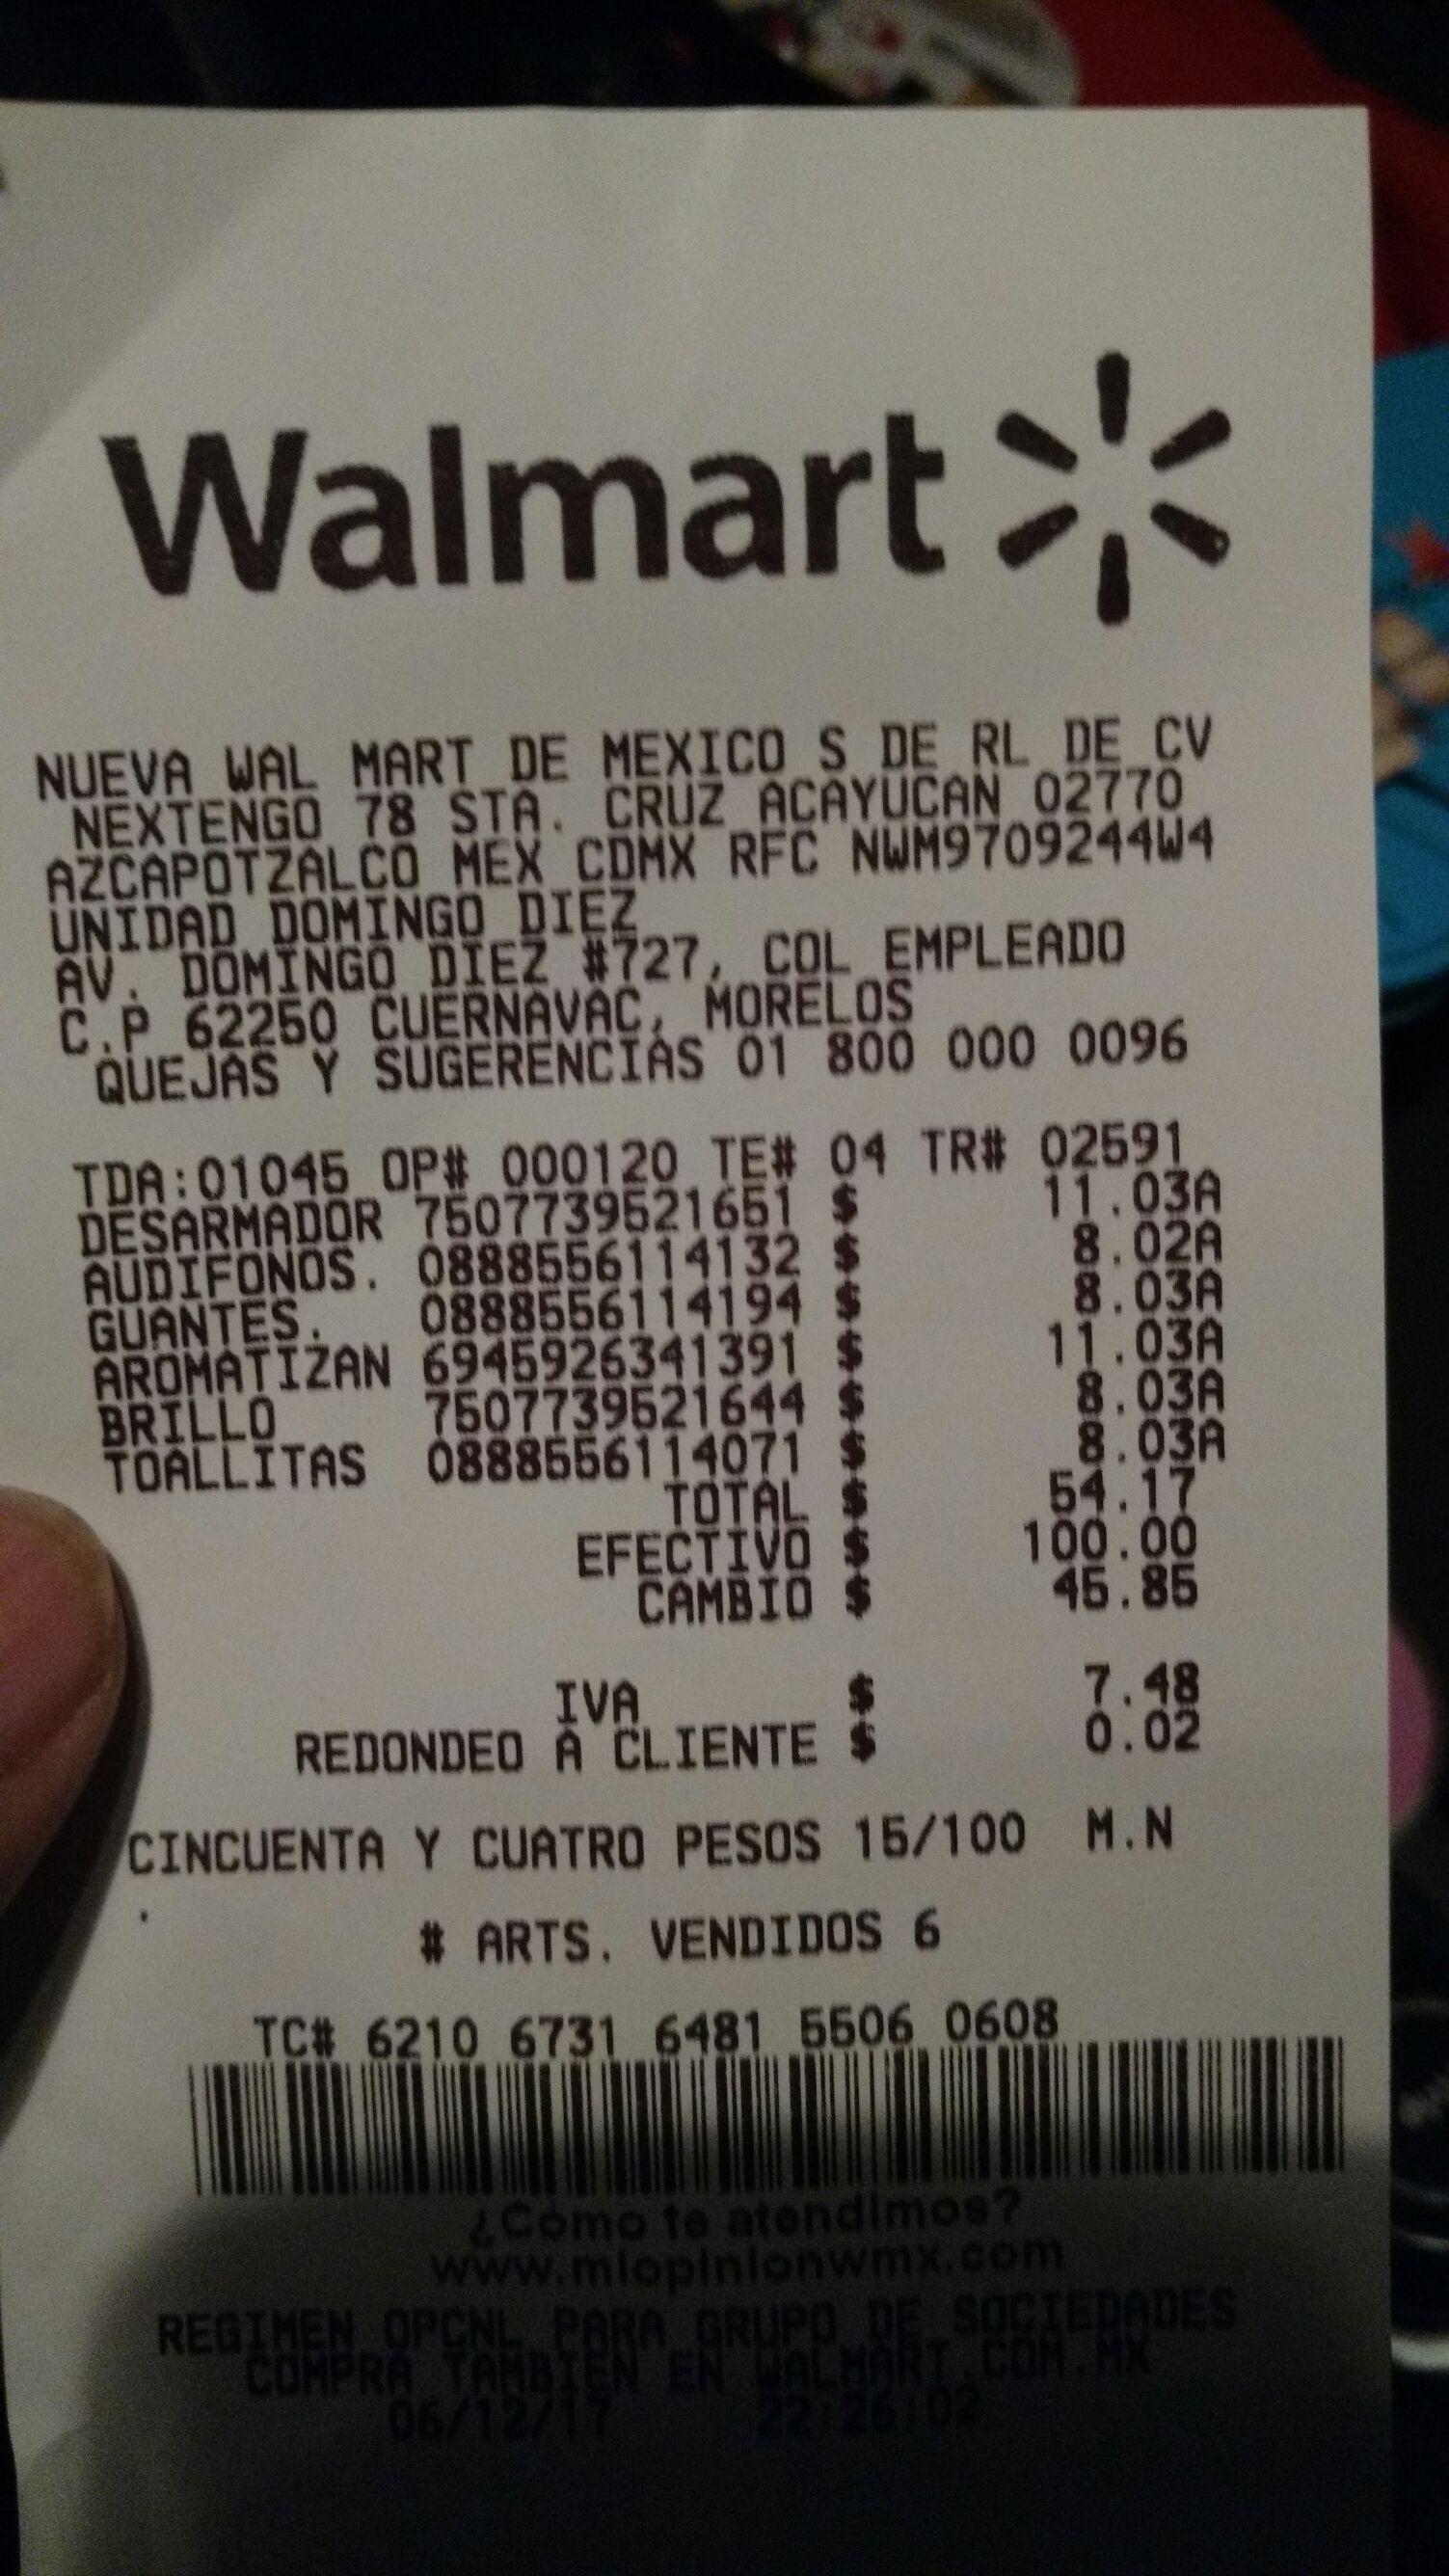 Walmart D Diez: Liquidaciones varias (ej. Desarmador a $12.03)